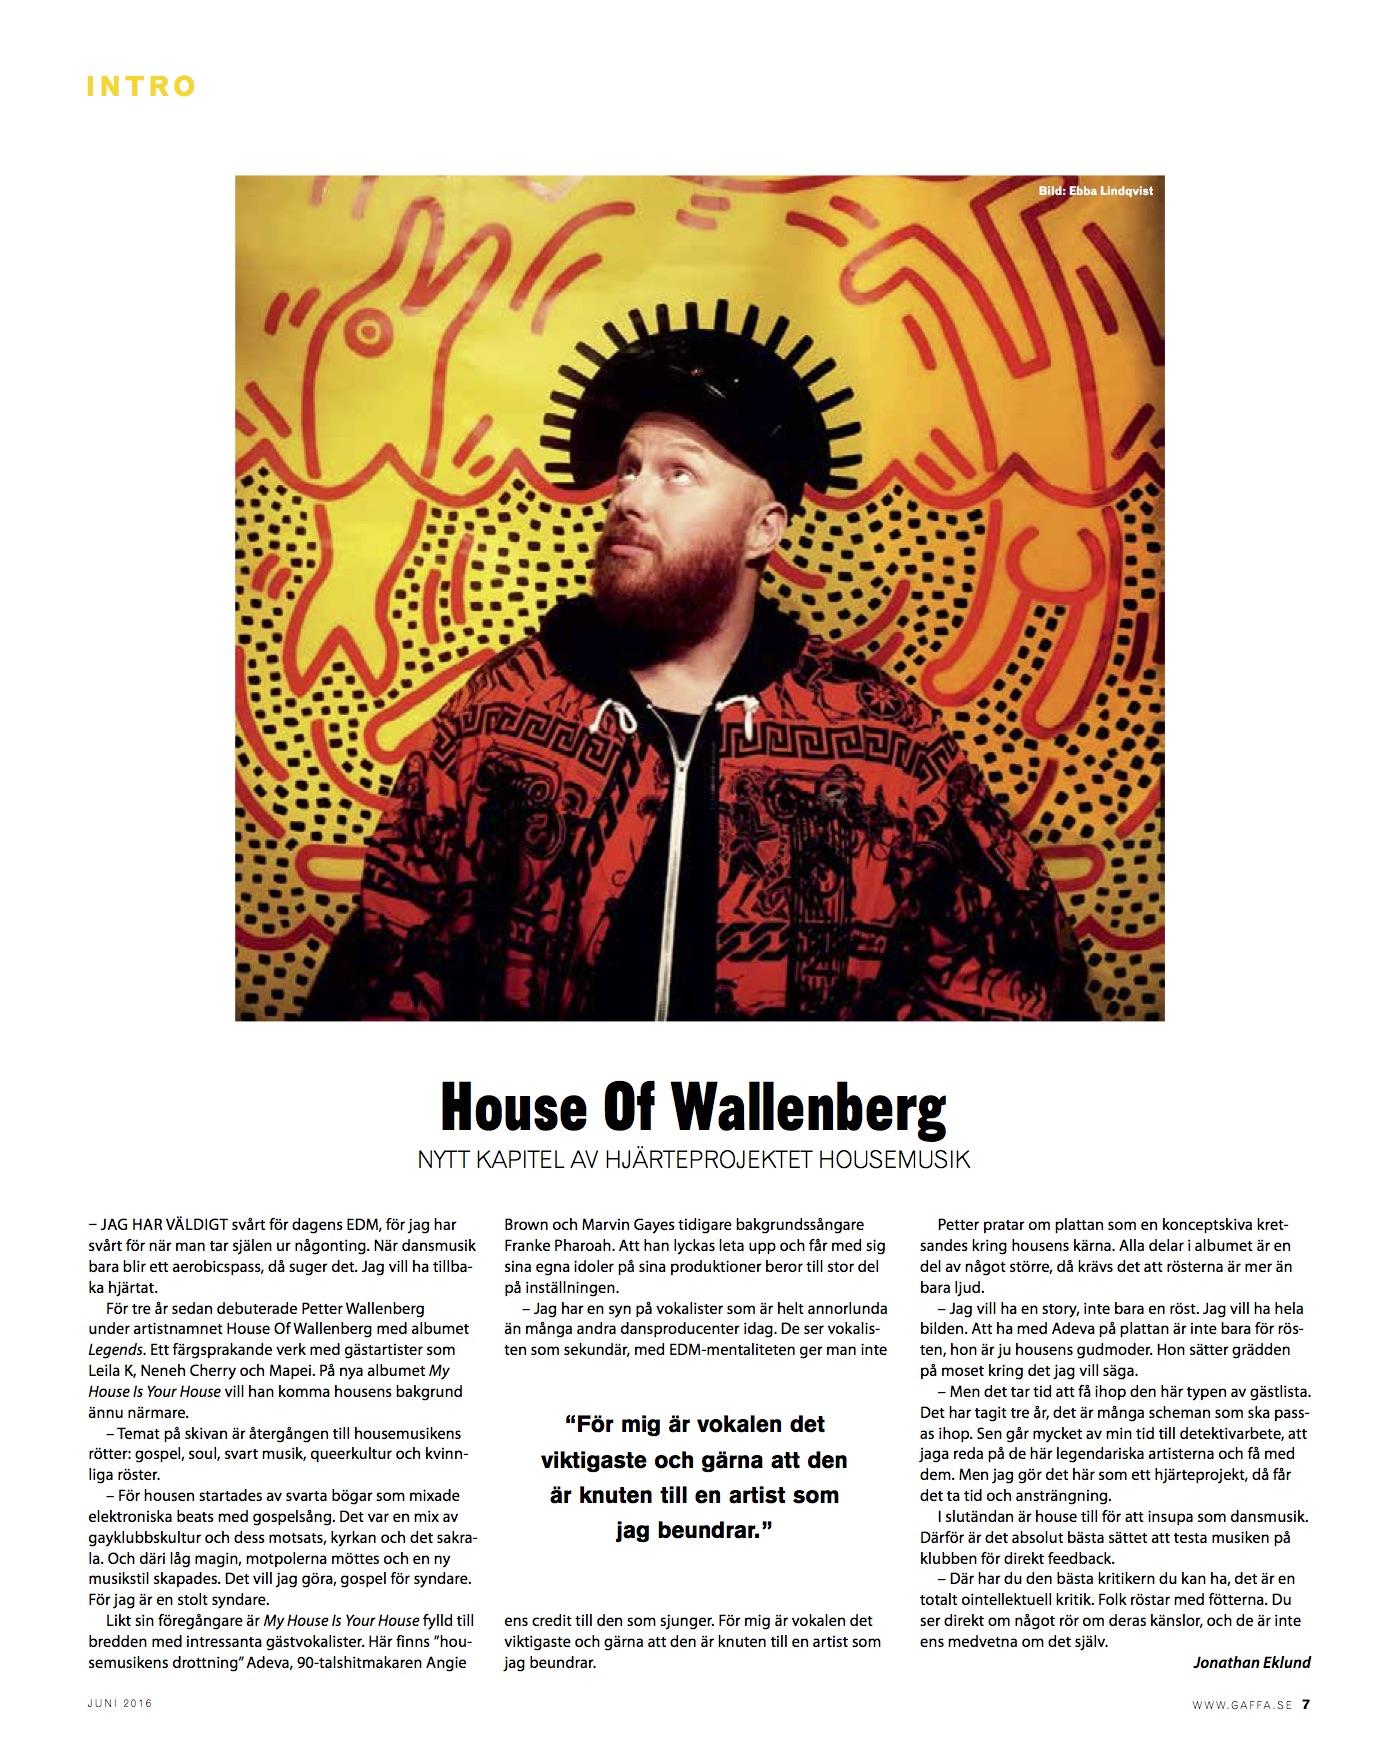 Gaffa intervju - House of Wallenberg.jpg